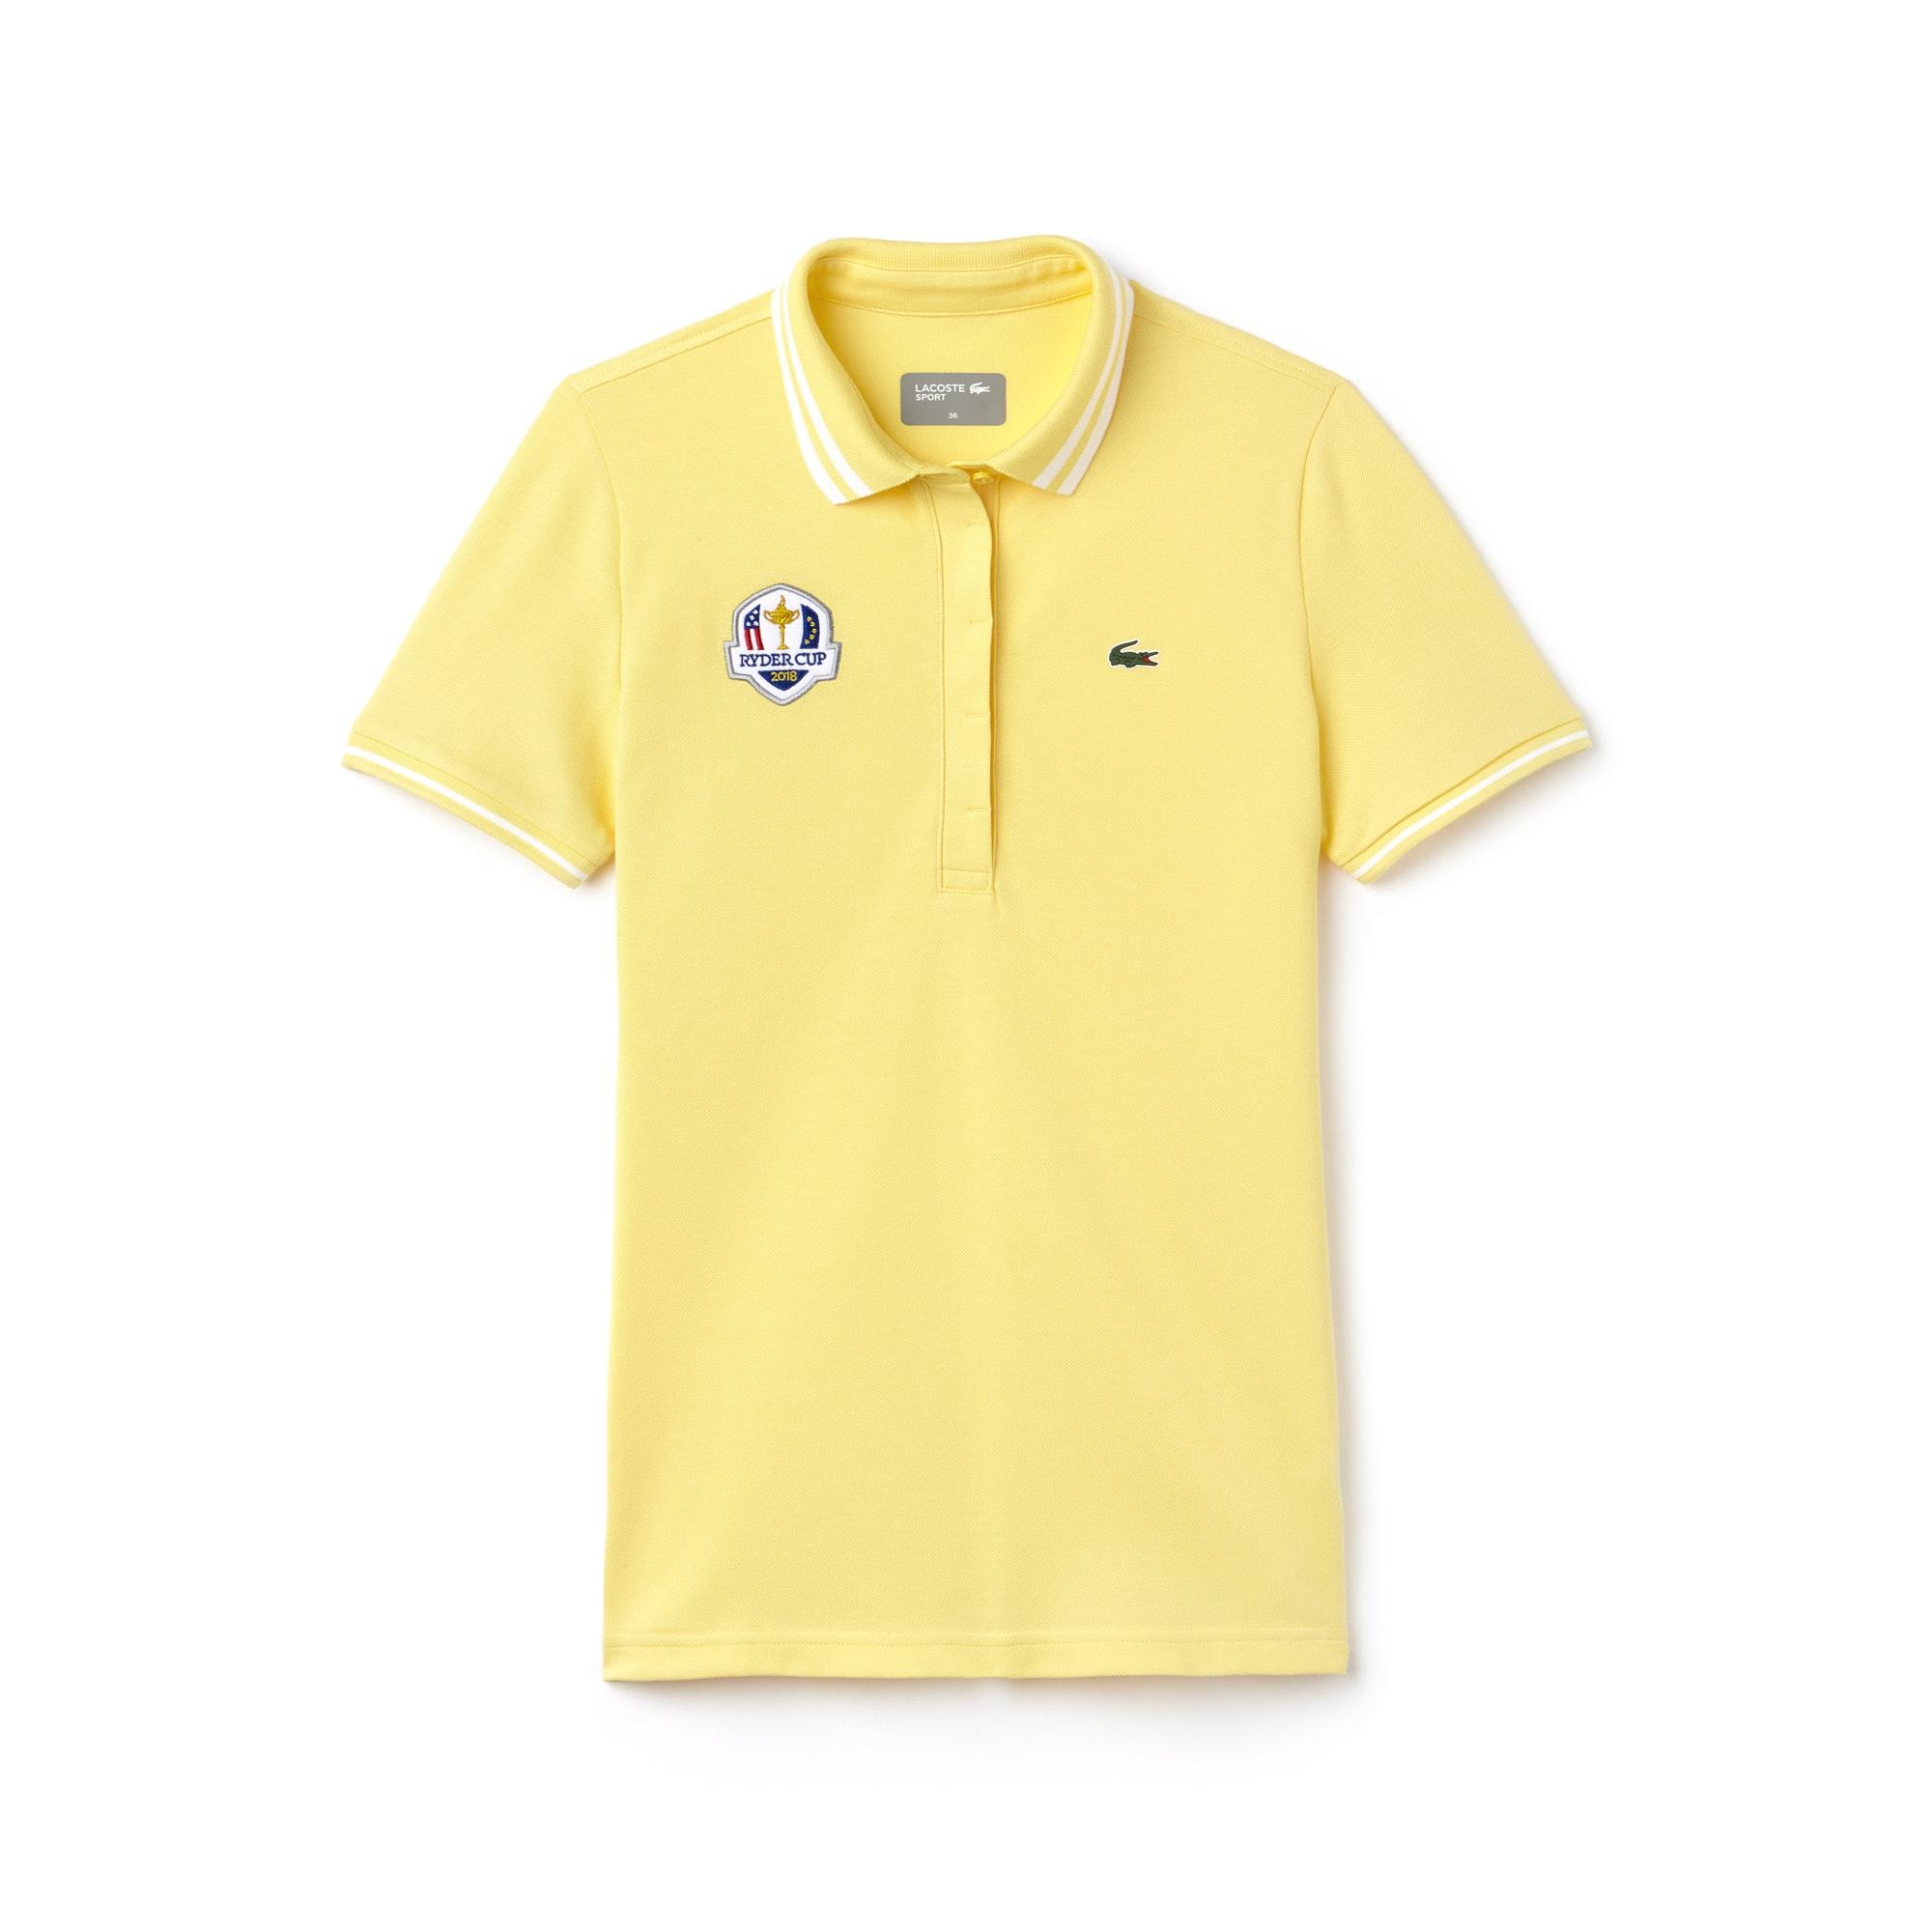 Women's Lacoste SPORT Ryder Cup Edition Tech Petit Piqué Golf Polo Shirt